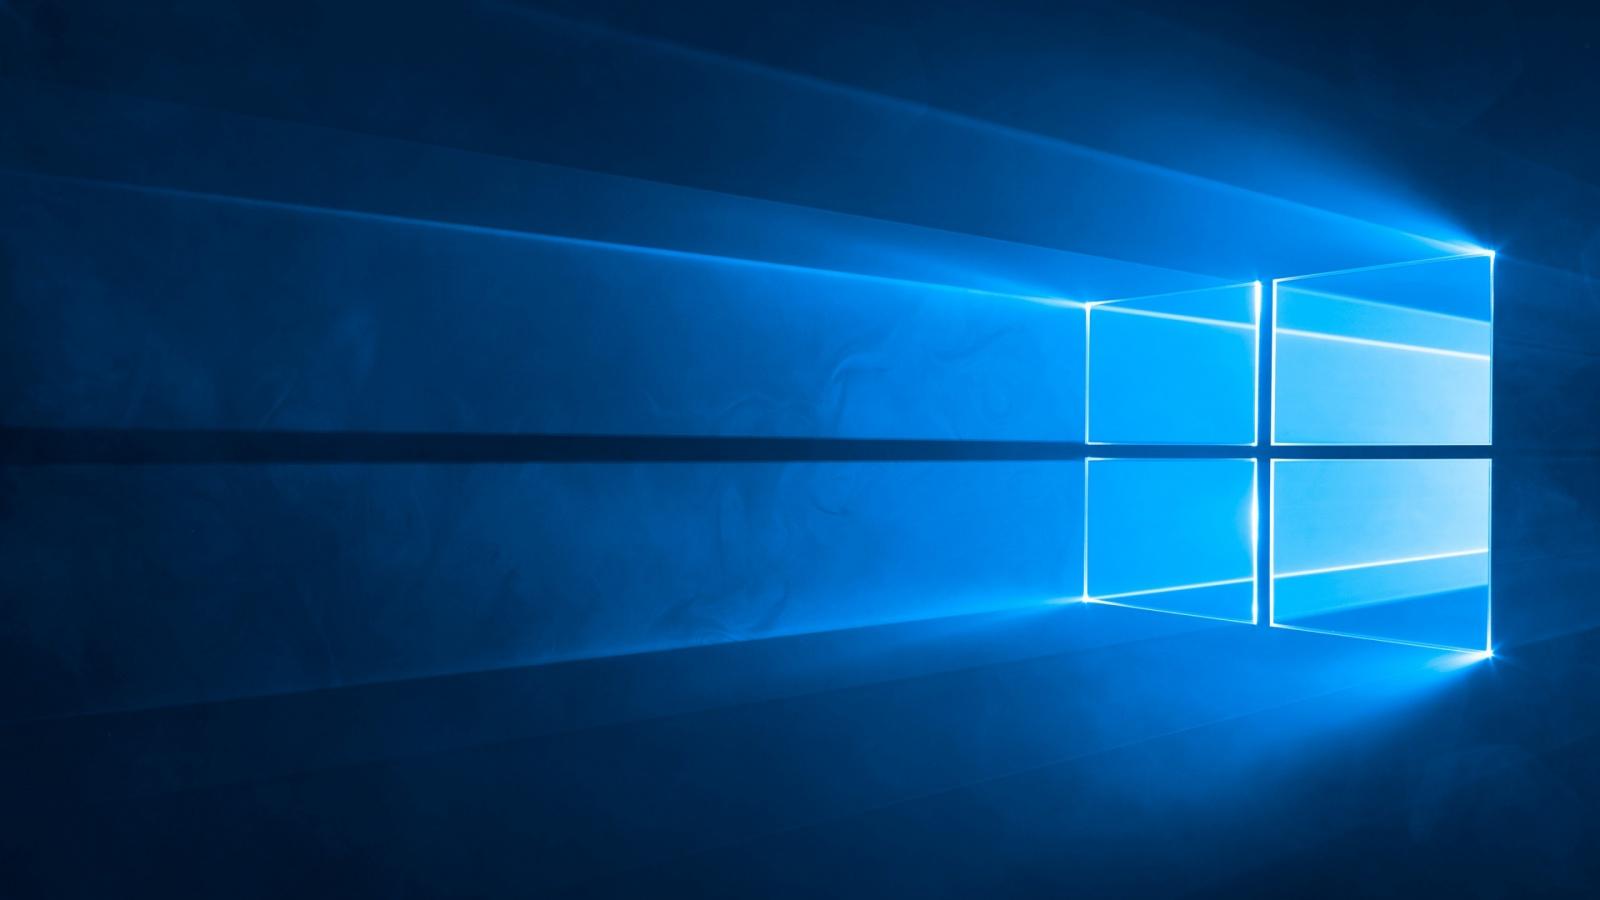 1600x900 Windows 10 Wallpaper Wallpapersafari